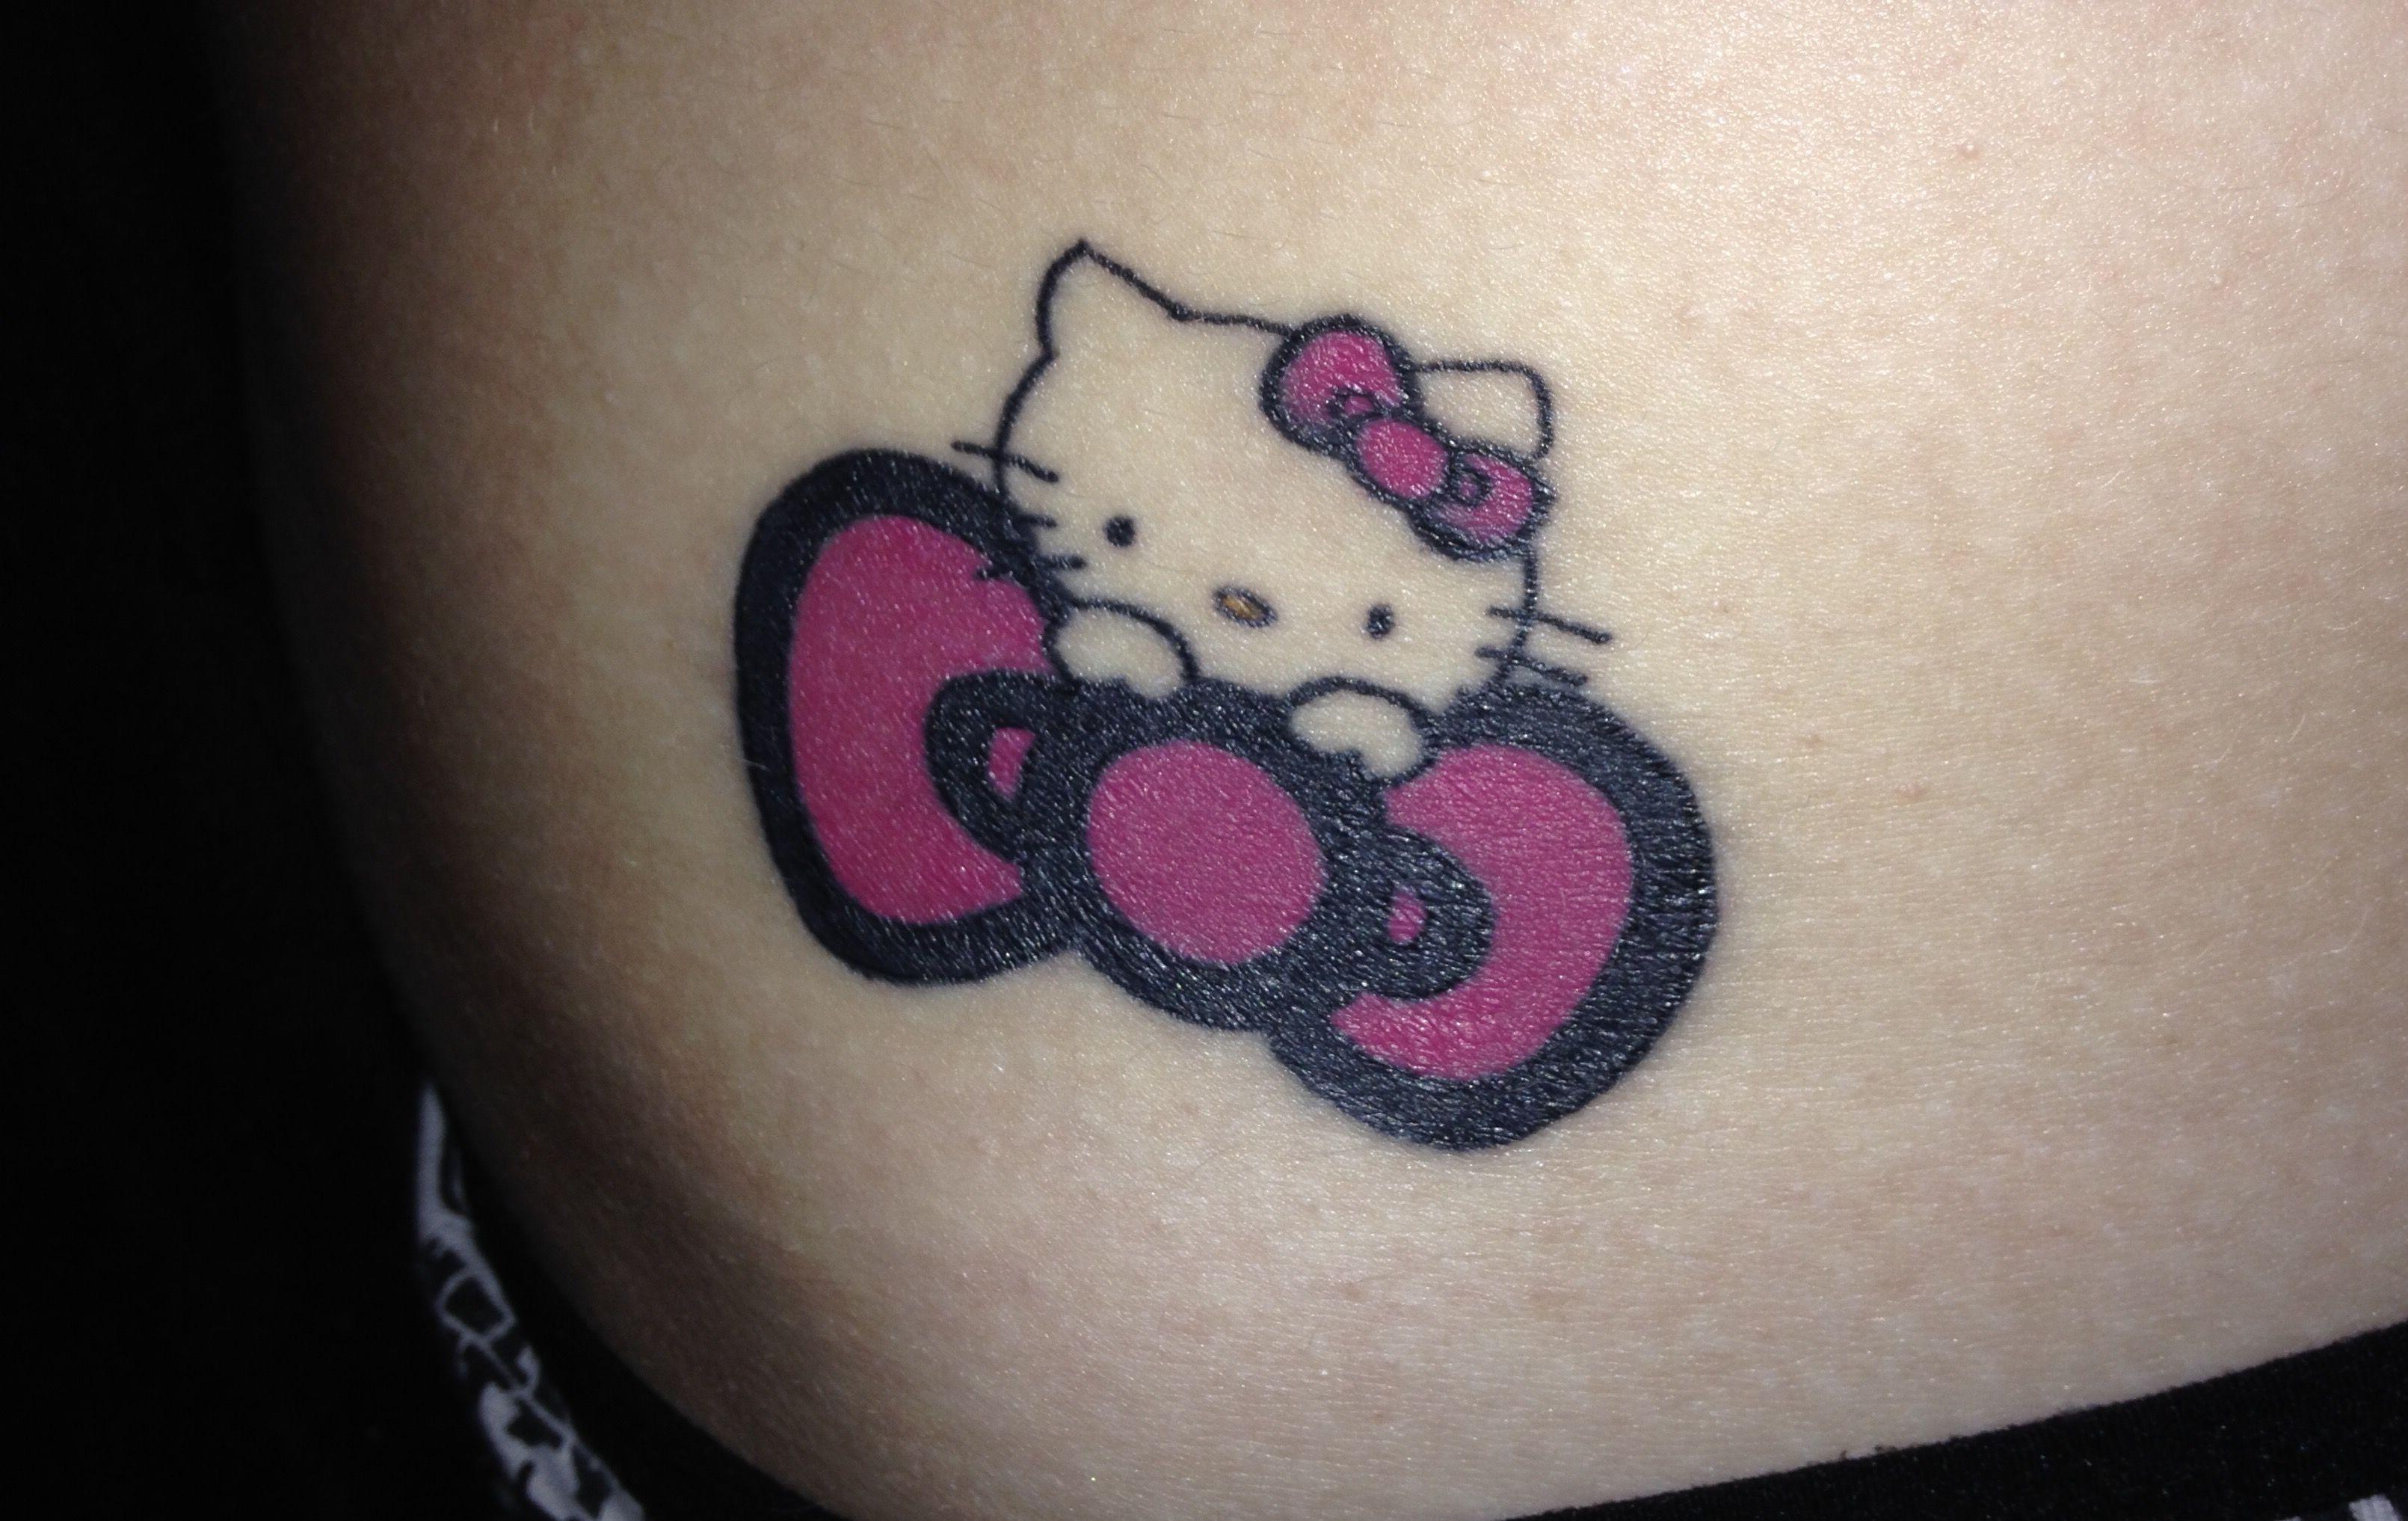 Hello Kitty Tattoo Firsttattoo Righthip Hellokitty Bow Cute Loveit Hello Kitty Tattoos Hello Kitty Bow Hello Kitty